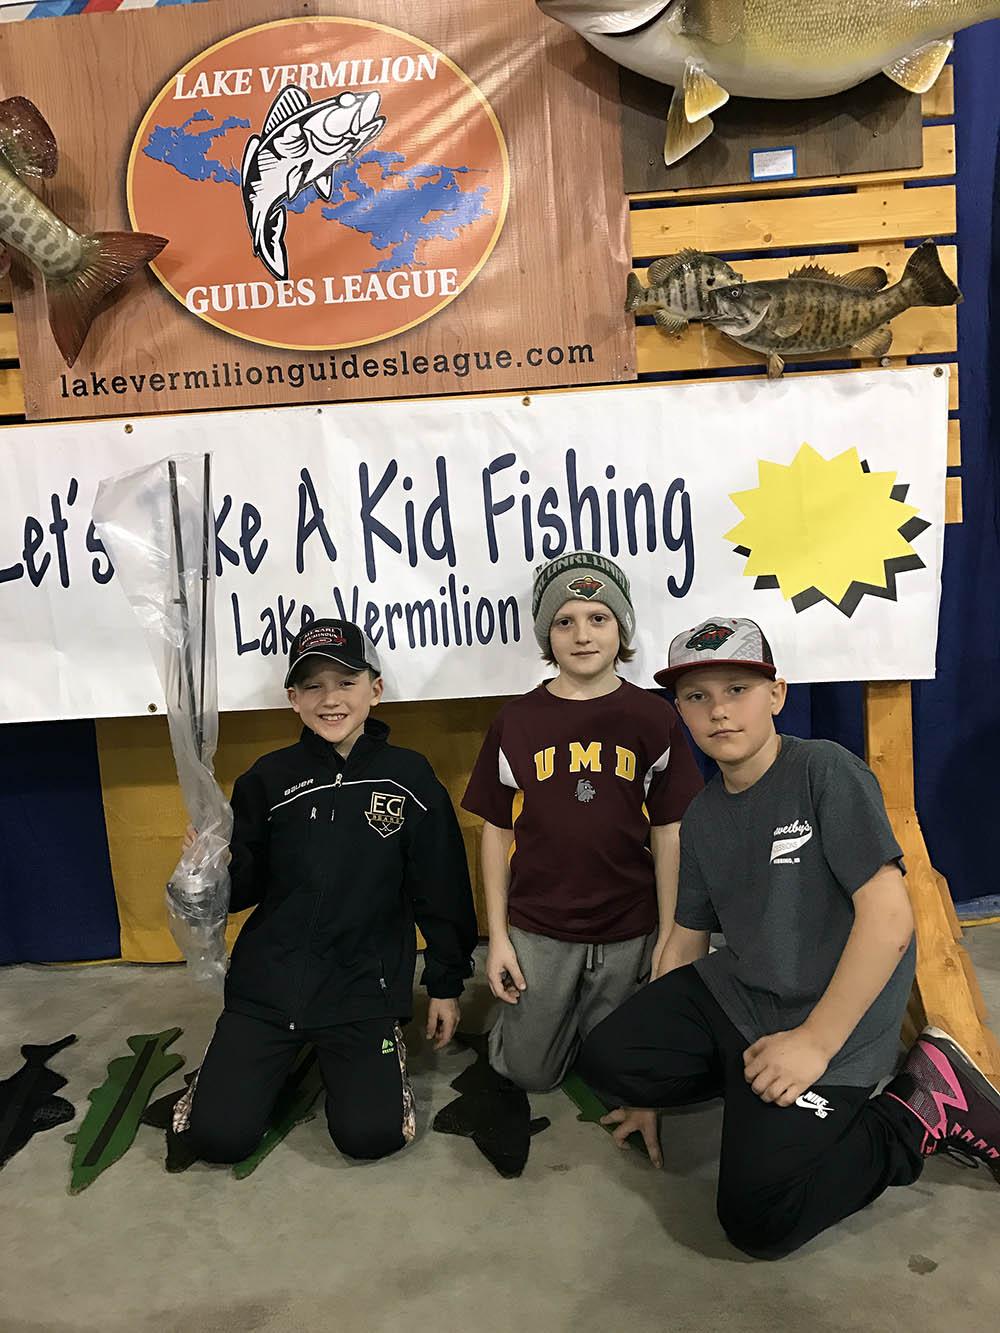 Lake vermilion fishing guides league home for Take a vet fishing